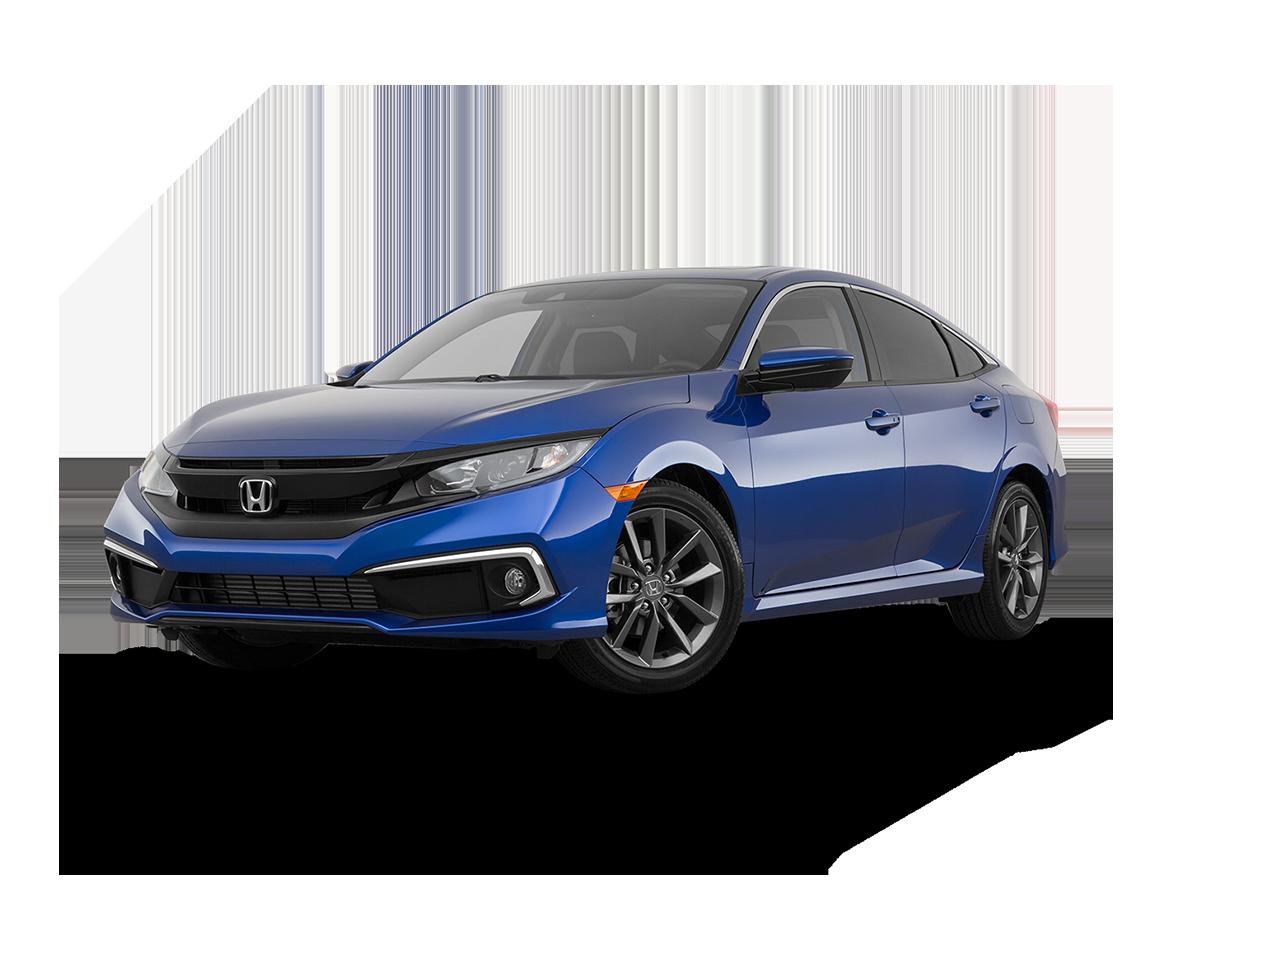 2019 Civic EX Sedan